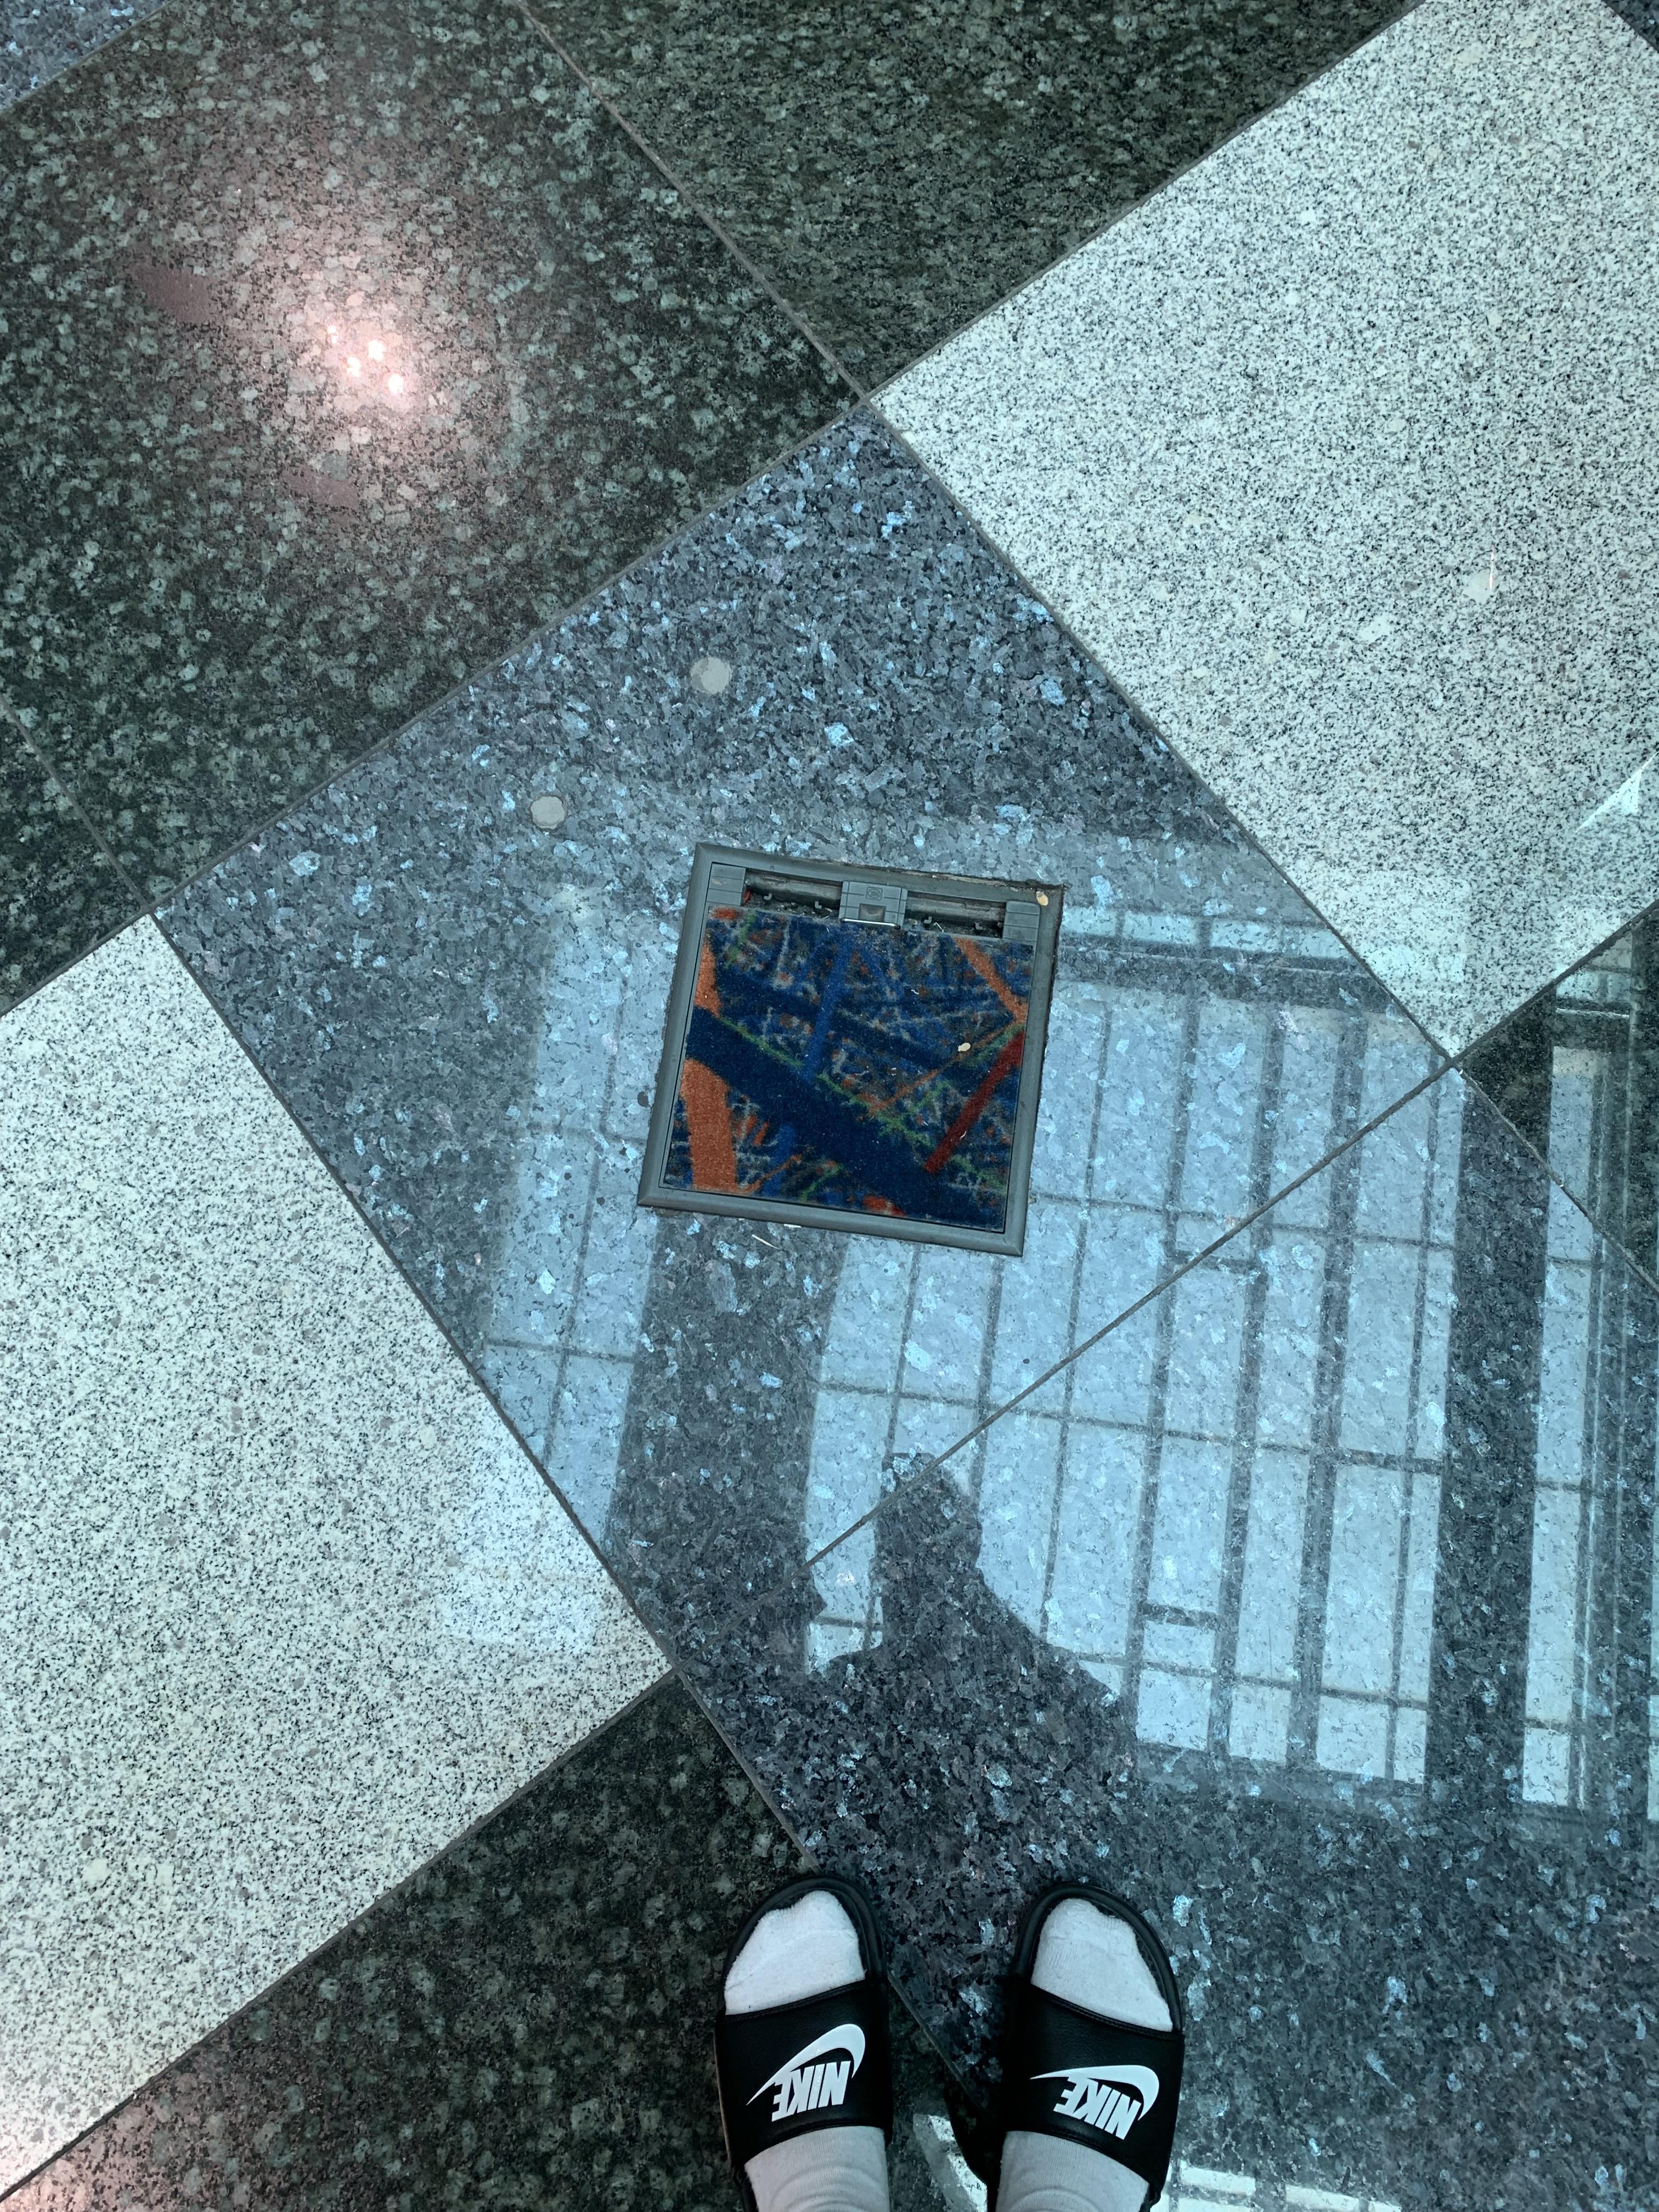 toxicidad Continuamente hazlo plano  This carpet job in Dubai airport | r/mildlyinteresting | Mildly Interesting  | Know Your Meme